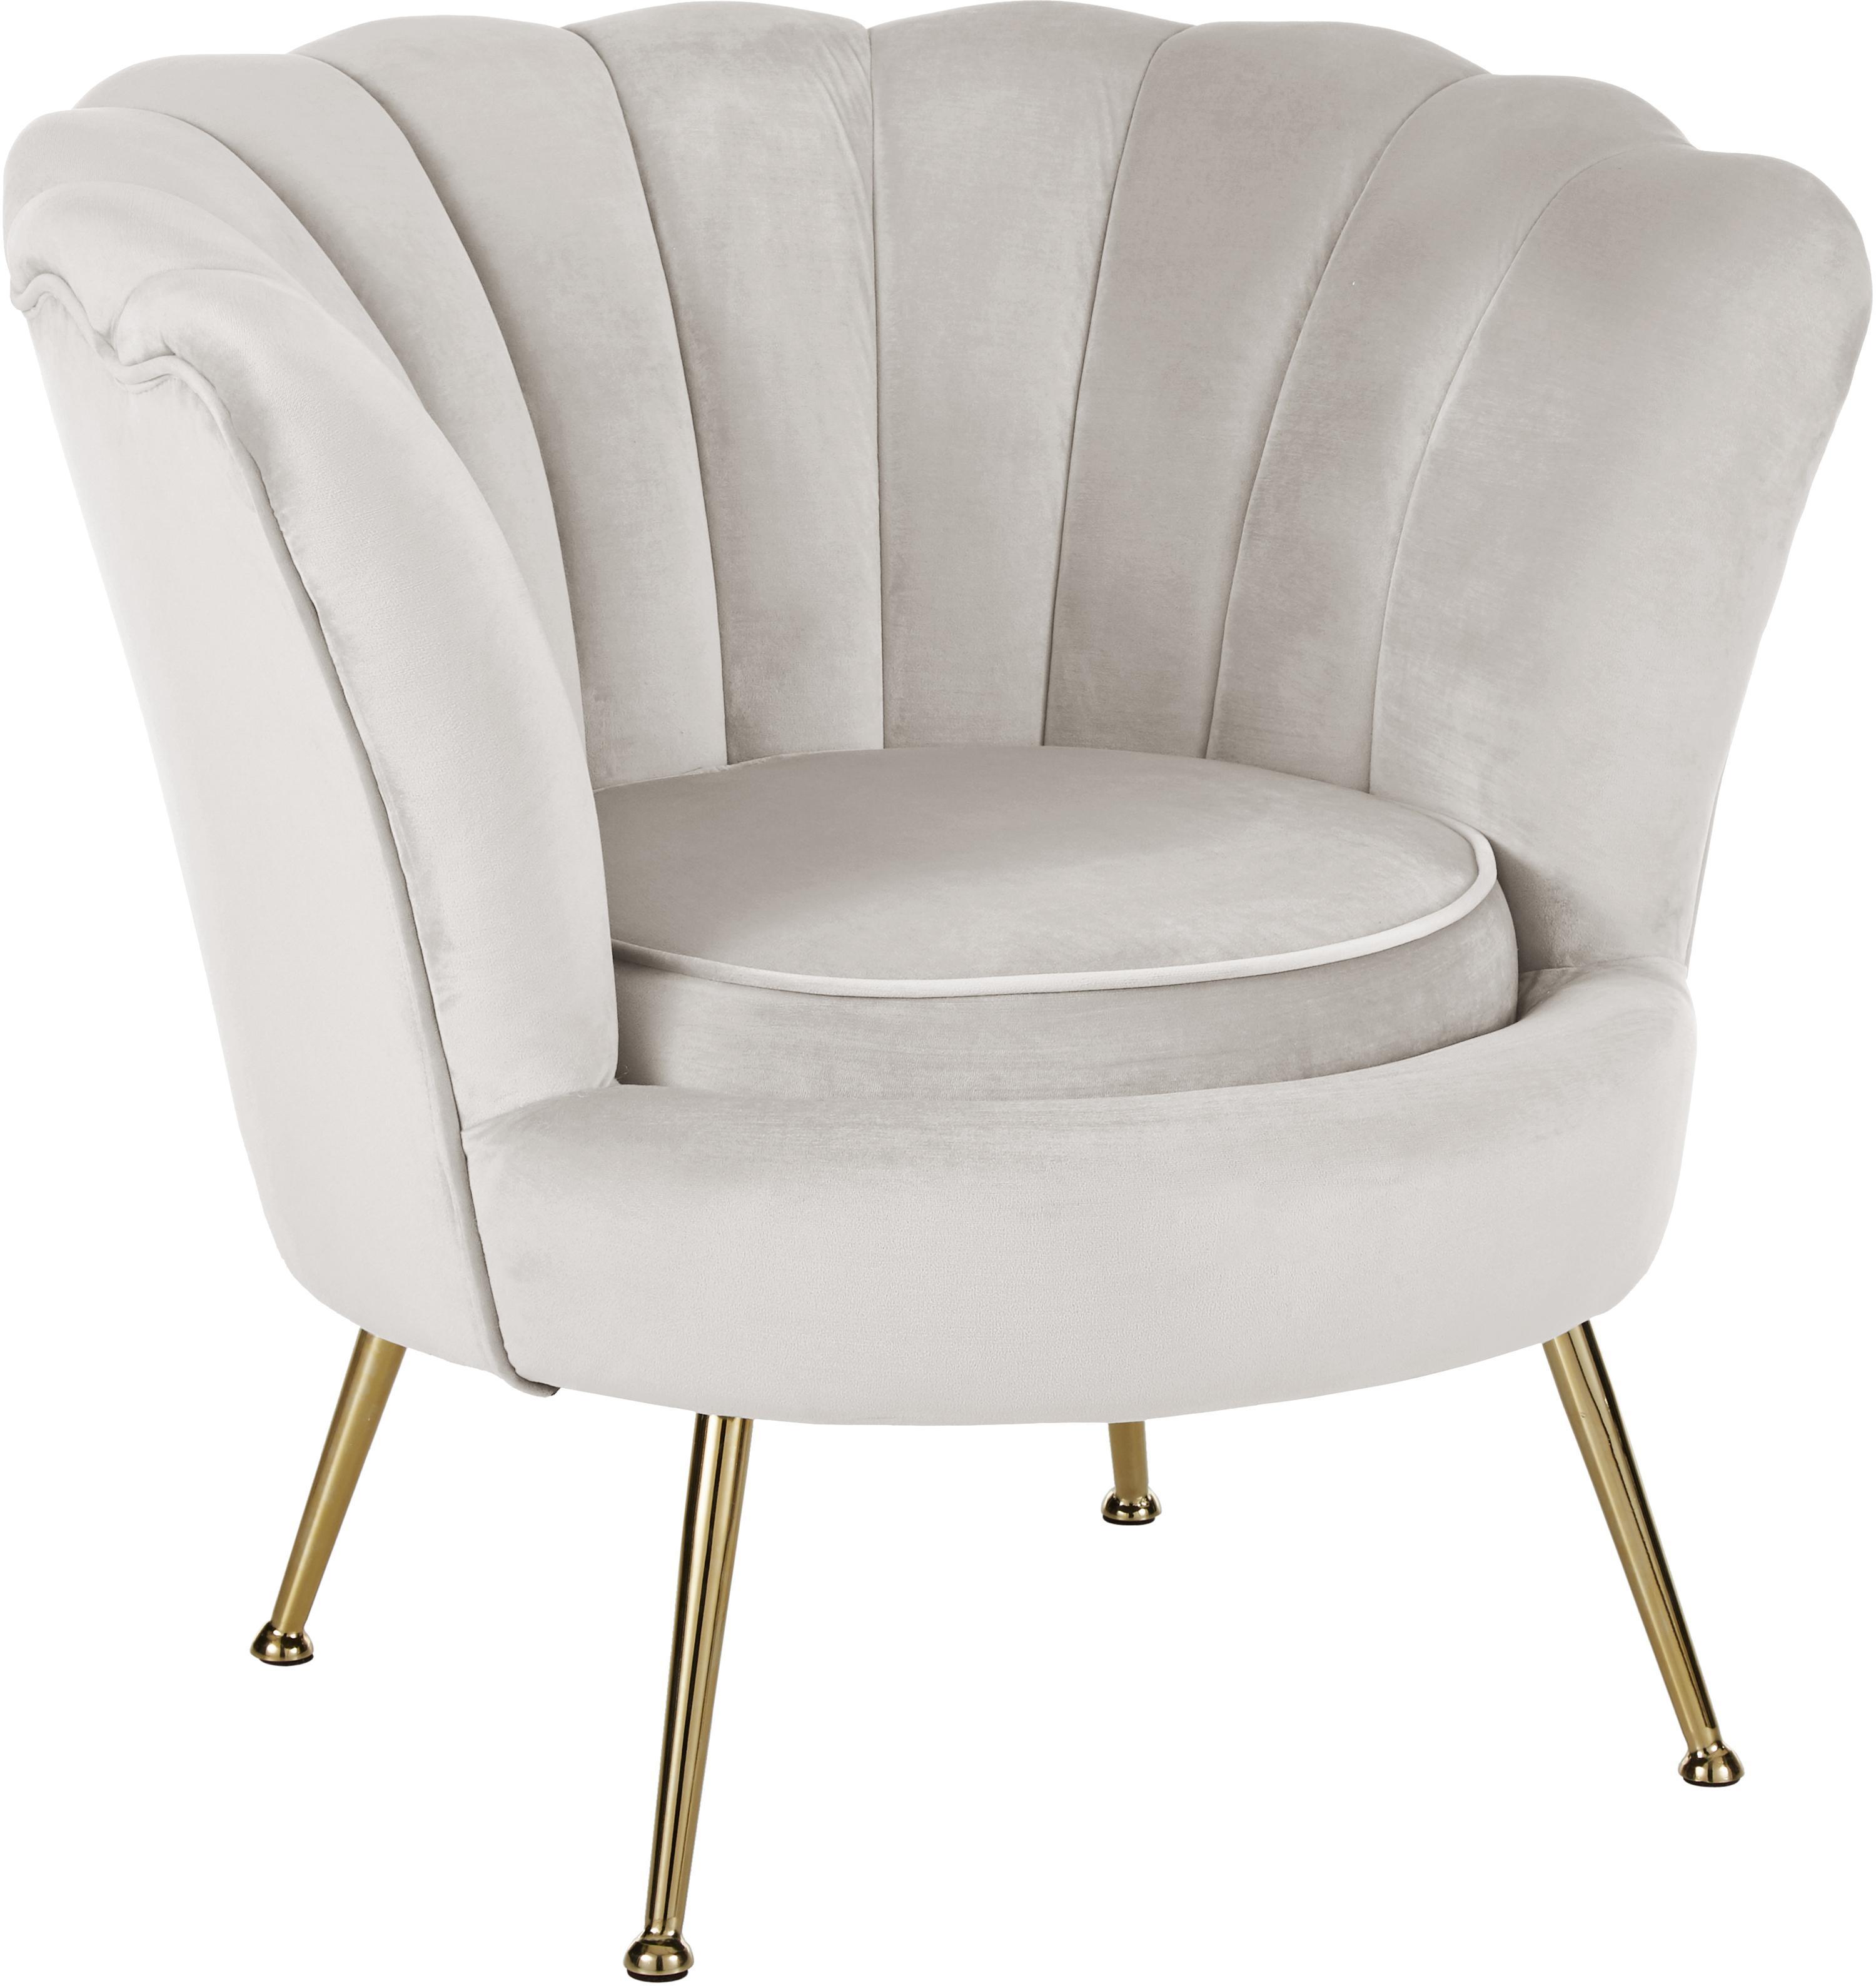 Fluwelen fauteuil Oyster, Bekleding: fluweel (polyester), Frame: multiplex, Poten: gegalvaniseerd metaal, Crèmewit, B 81 x D 78 cm